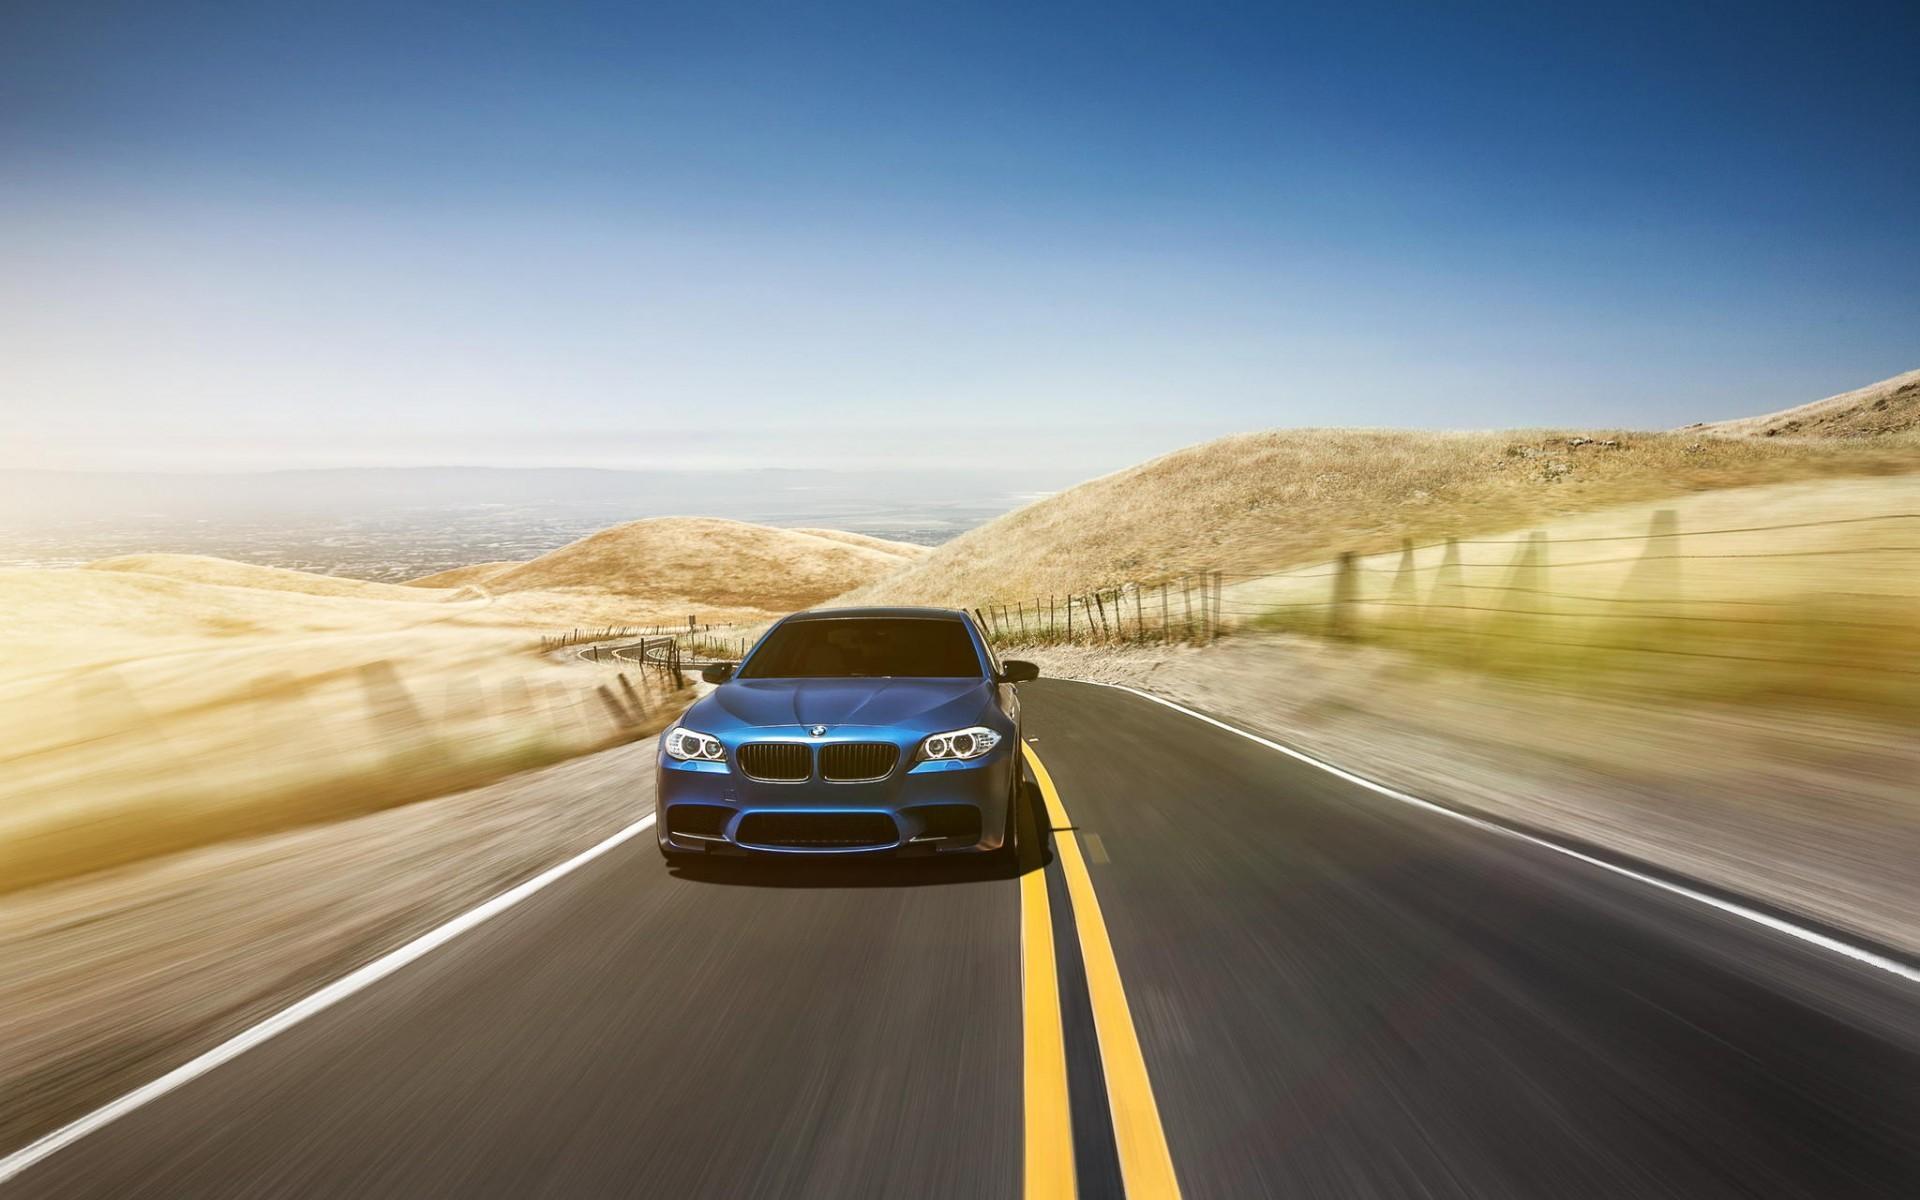 Wallpaper : 1920x1200 px, blue cars, BMW M5, car, road ...